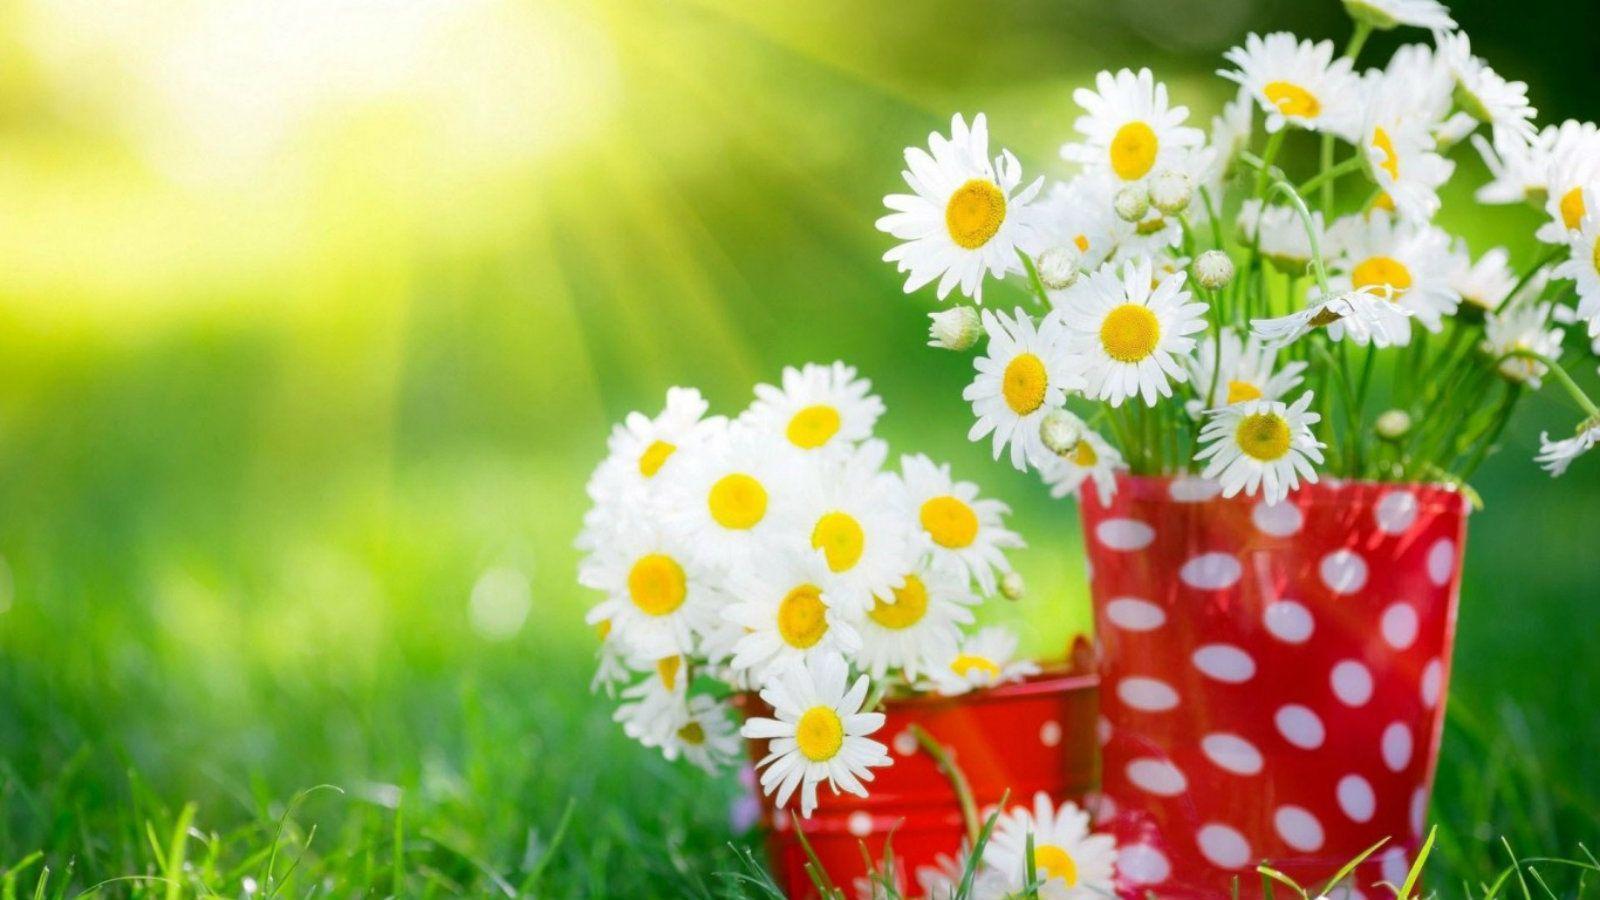 Nature Flower Wallpaper Hd For Desktop Free Flowers Healthy